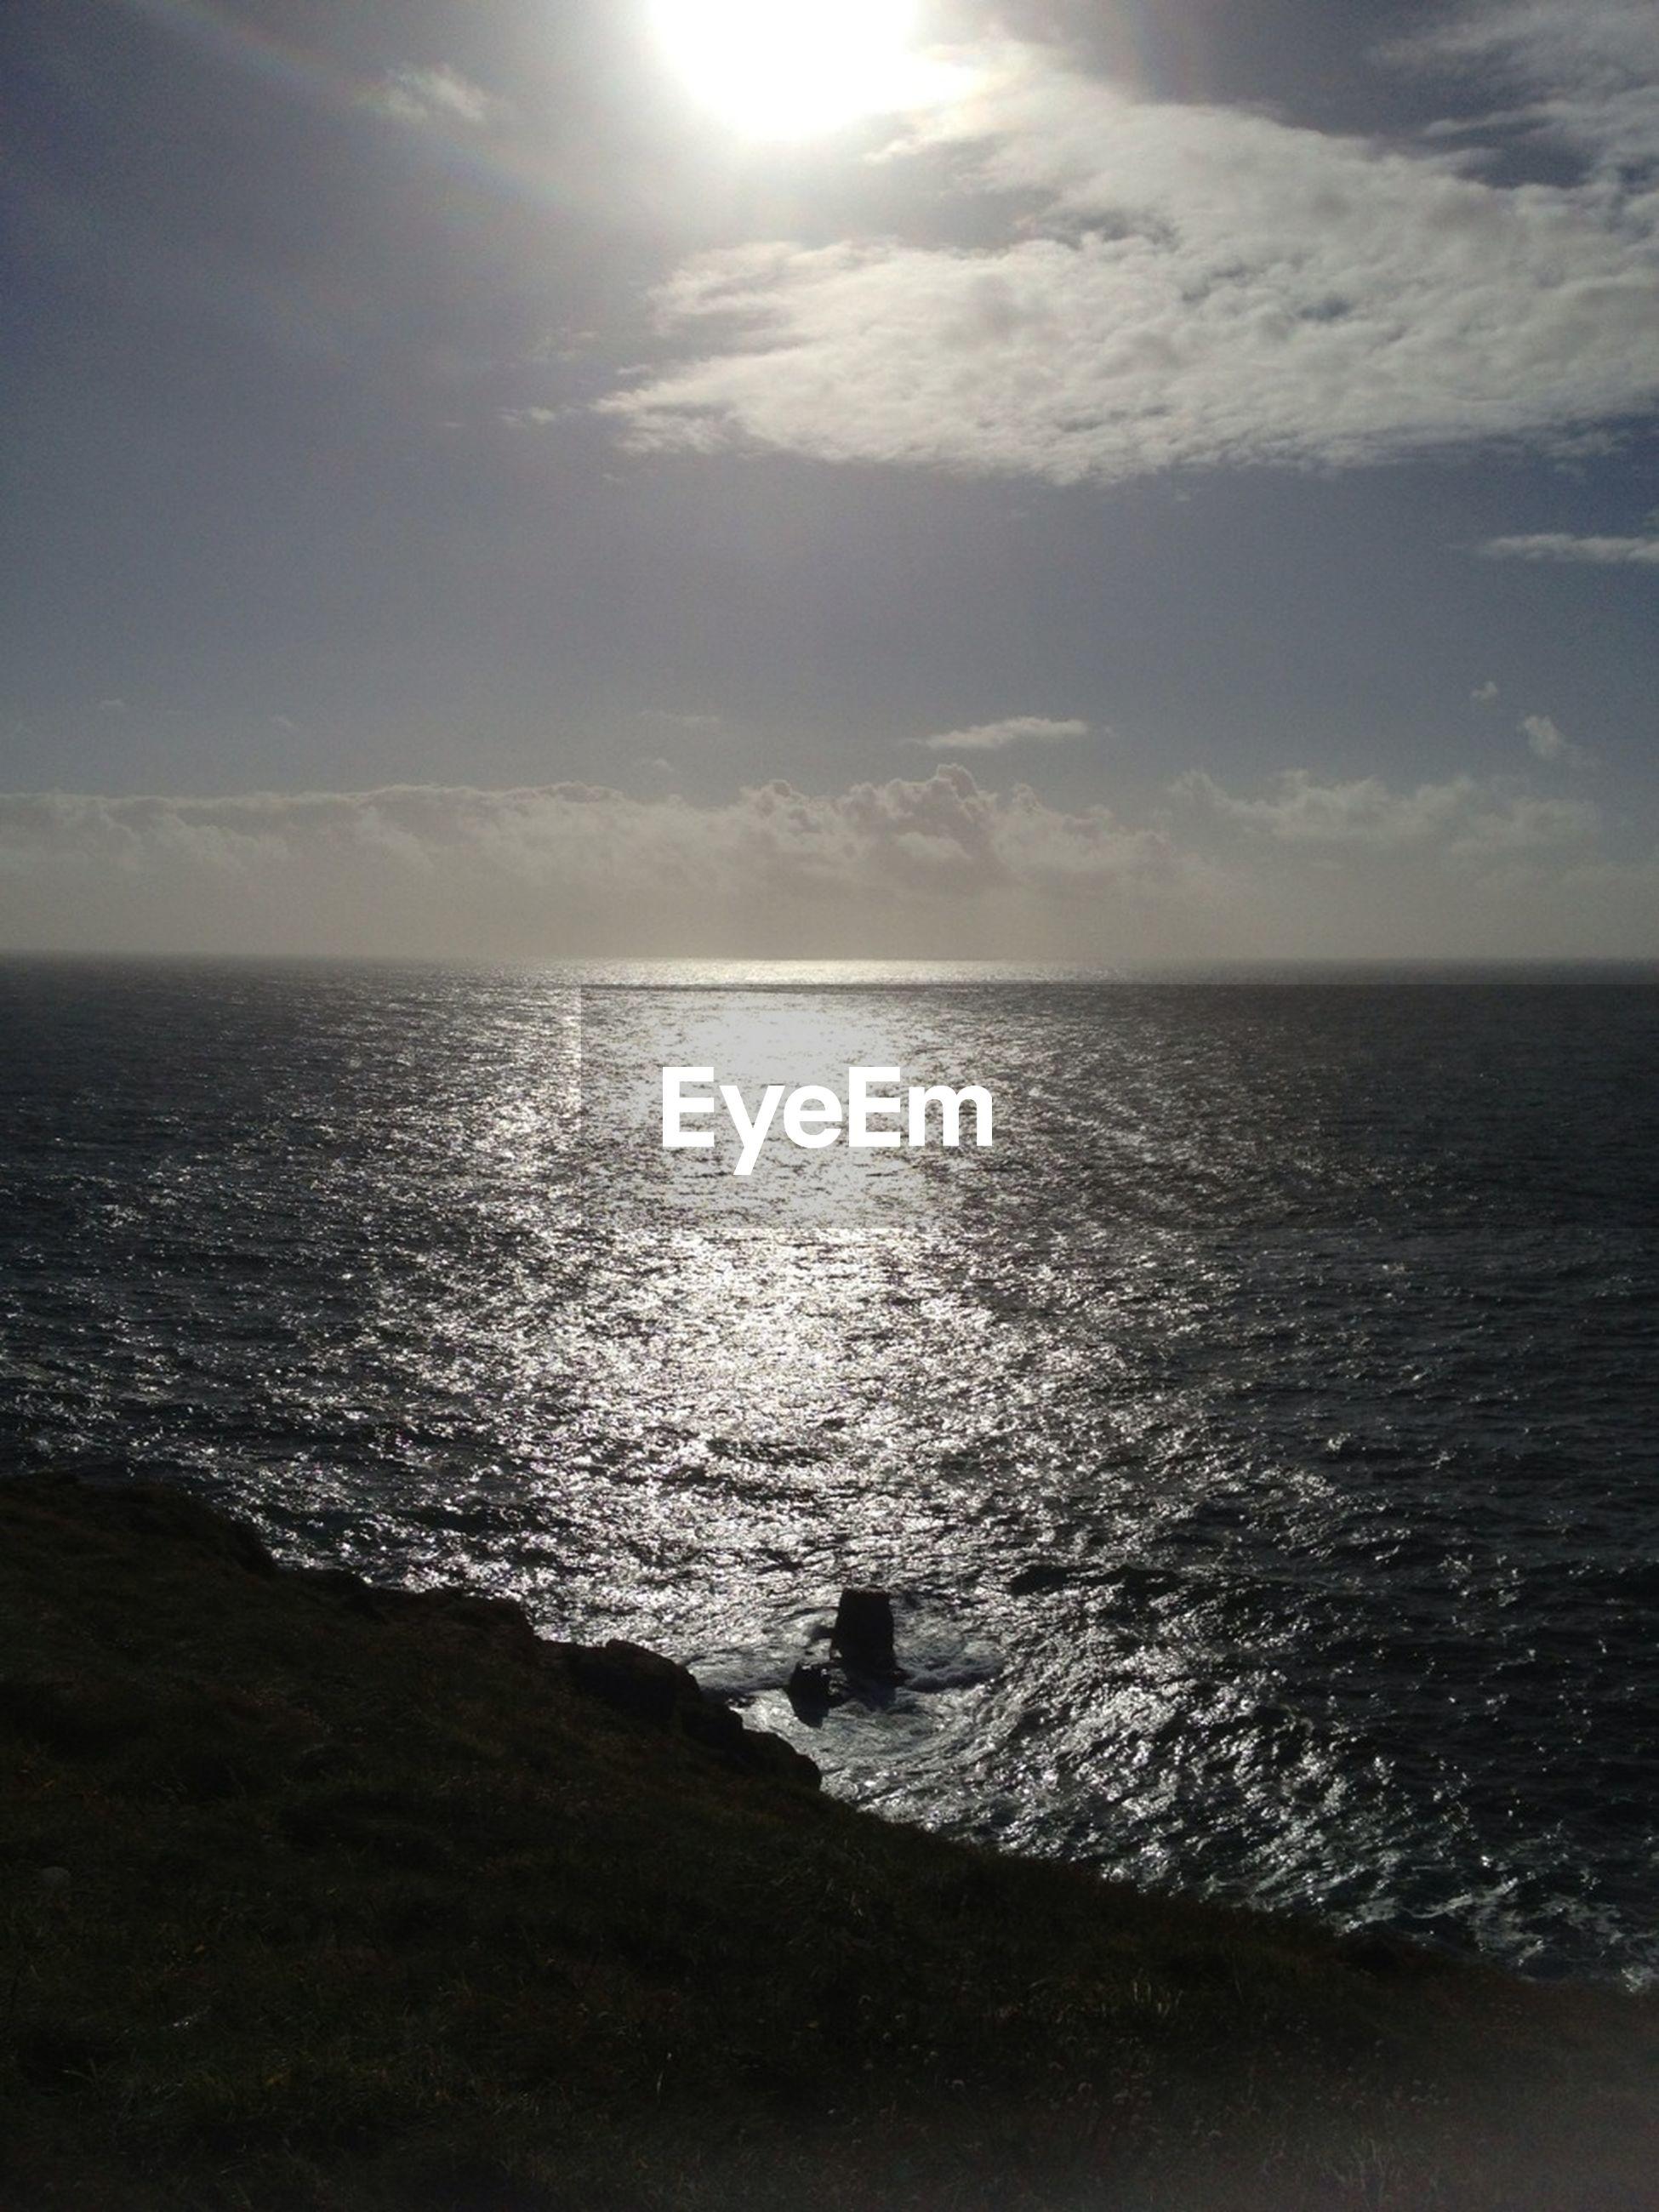 sea, horizon over water, water, tranquil scene, scenics, tranquility, sky, beauty in nature, sun, nature, idyllic, reflection, seascape, beach, sunset, cloud - sky, sunlight, shore, rippled, sunbeam